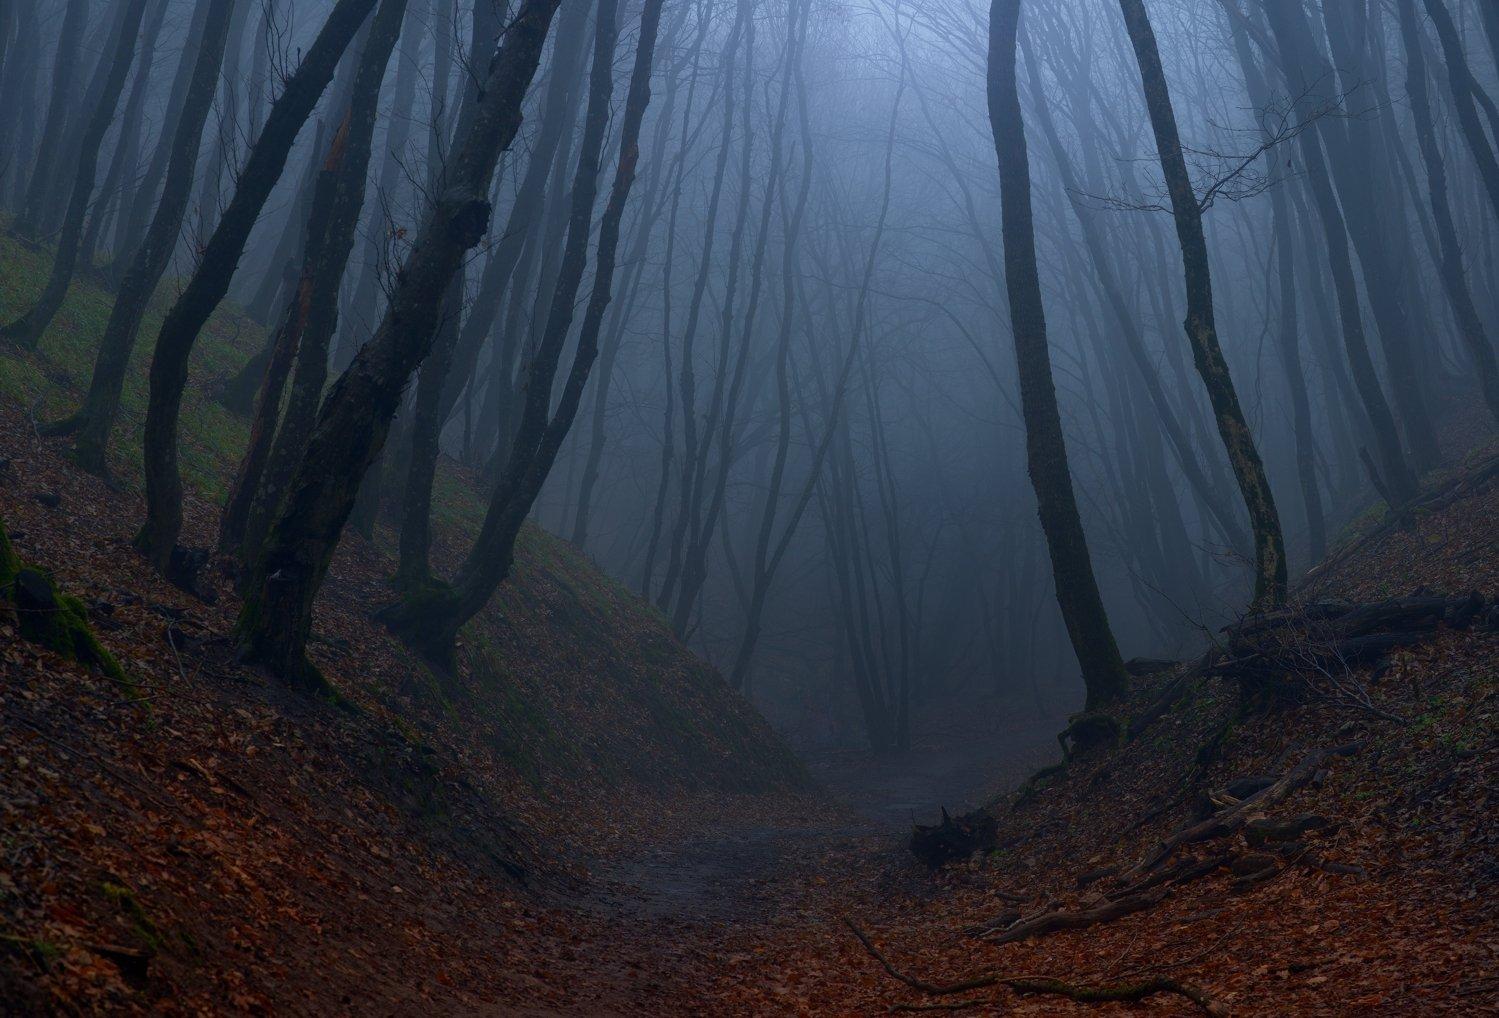 осень листва утро деревья, Александр Жарников